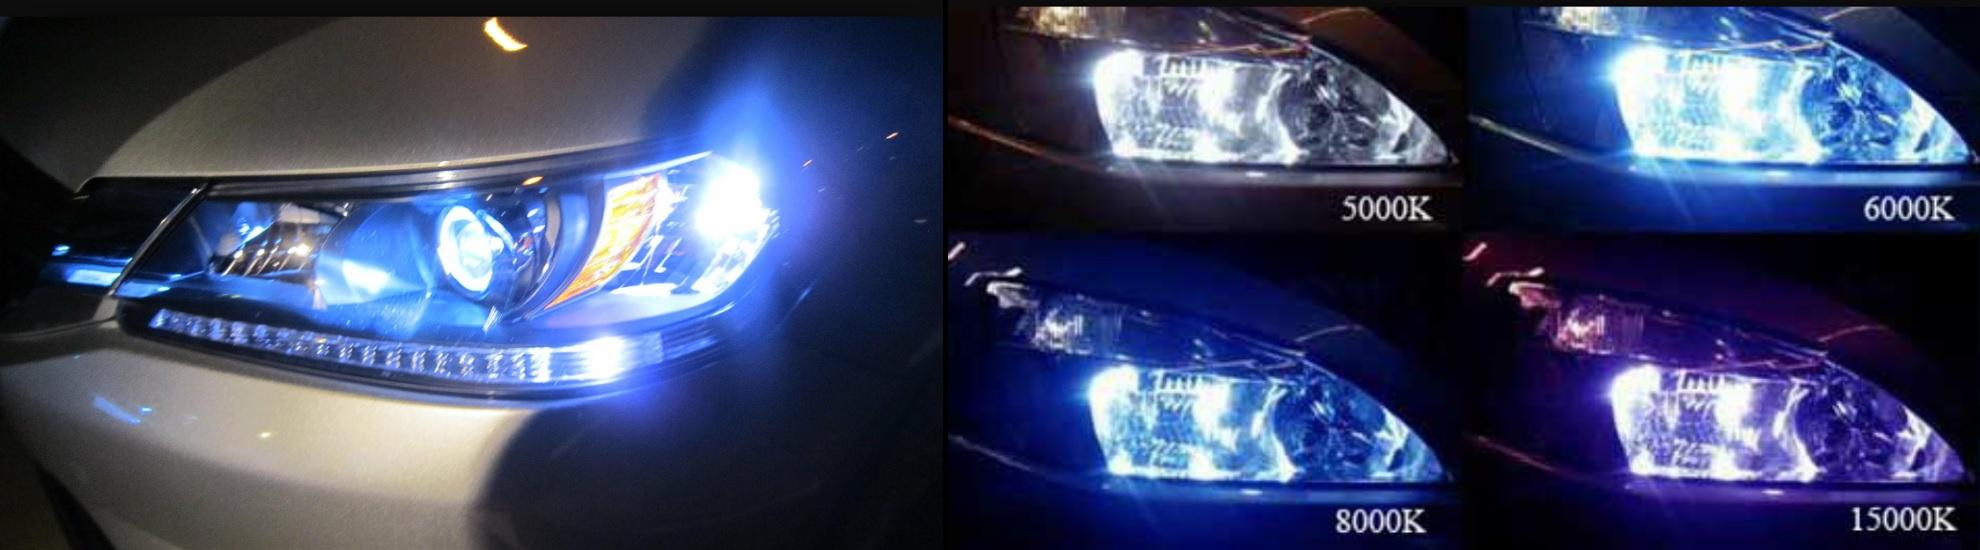 youtube lights pdls porsche led also vs xenon halogen headlights lighting watch